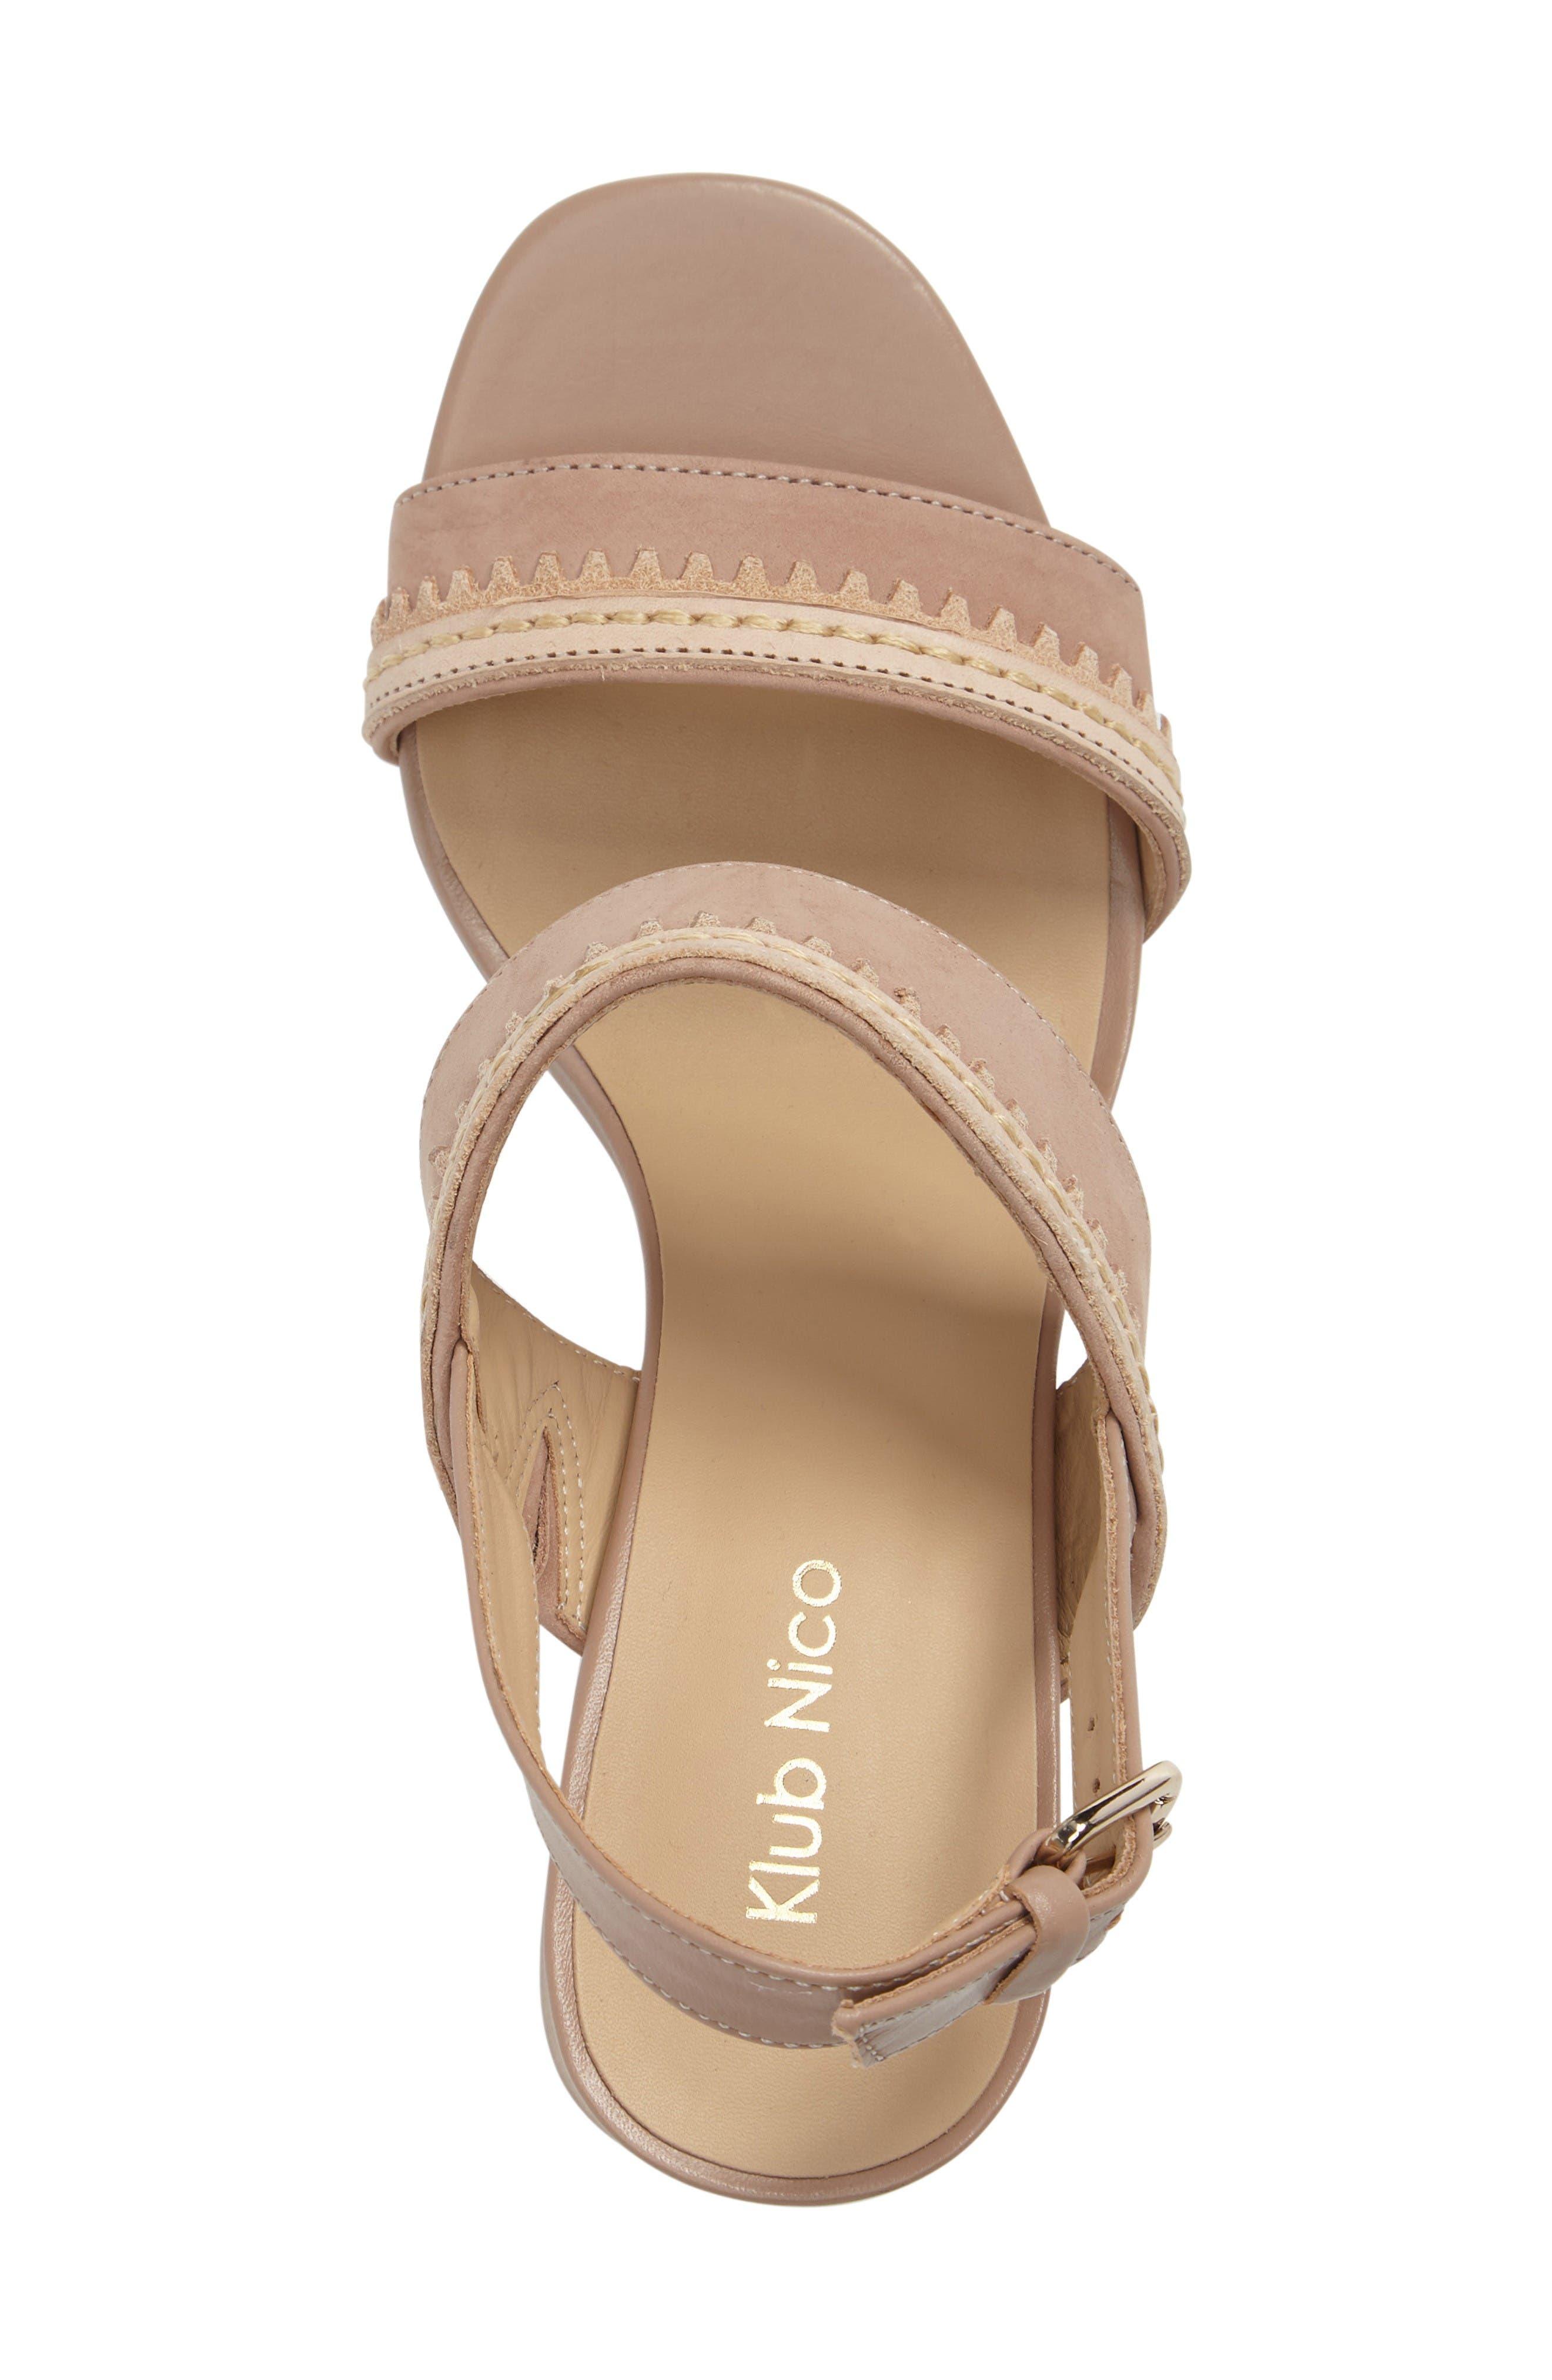 Rycca Block Heel Sandal,                             Alternate thumbnail 3, color,                             Blush Leather